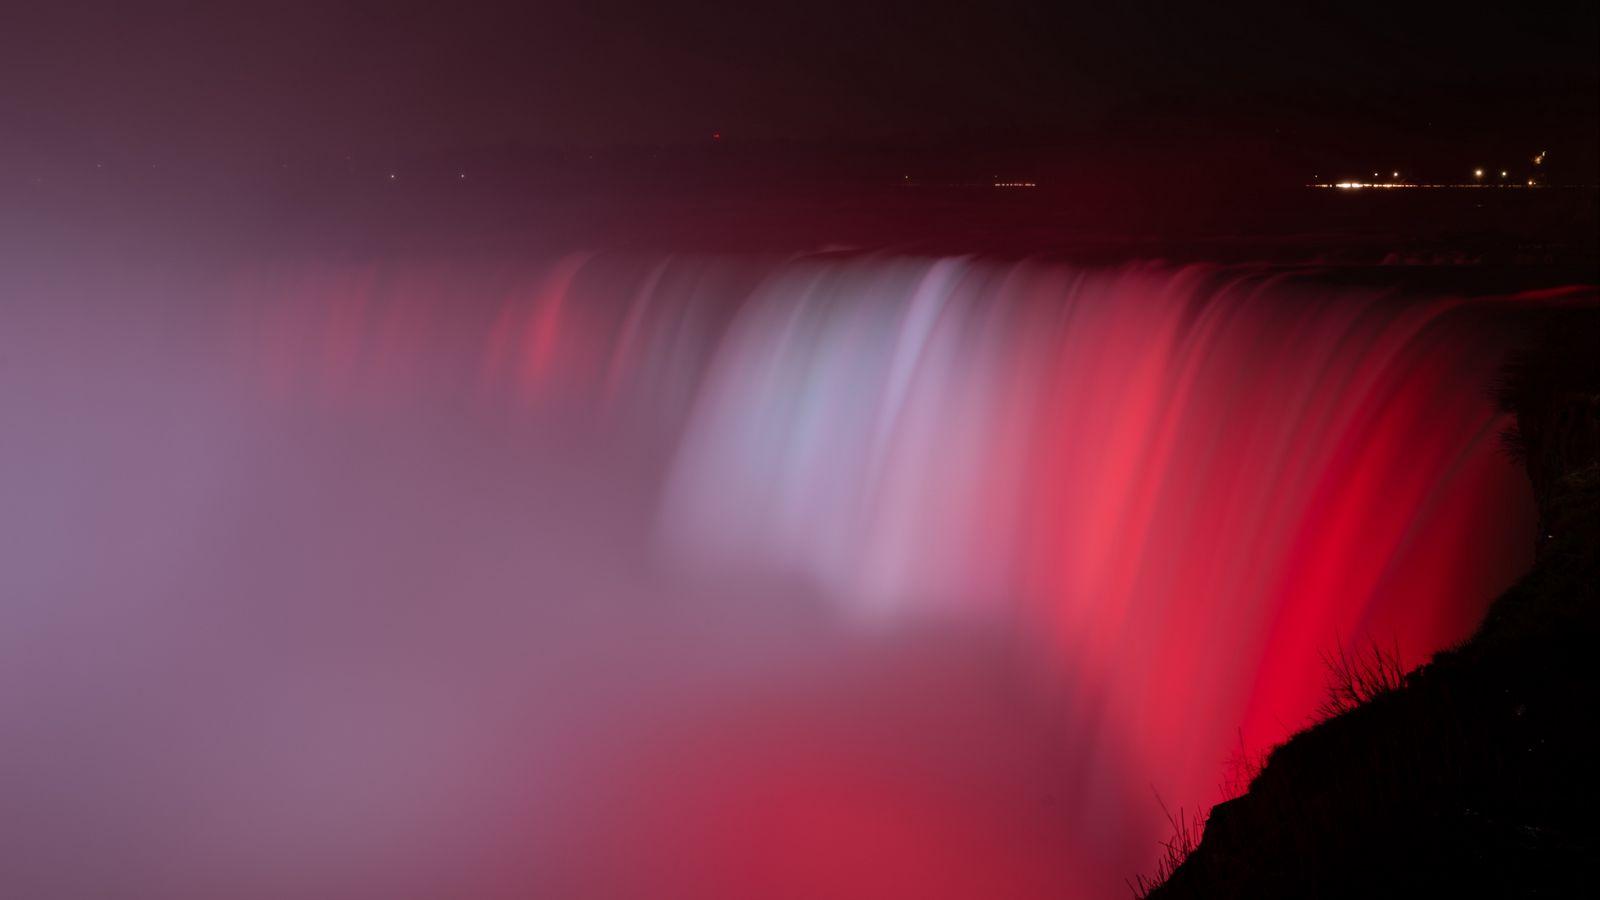 1600x900 Wallpaper waterfall, fog, backlight, red, dark